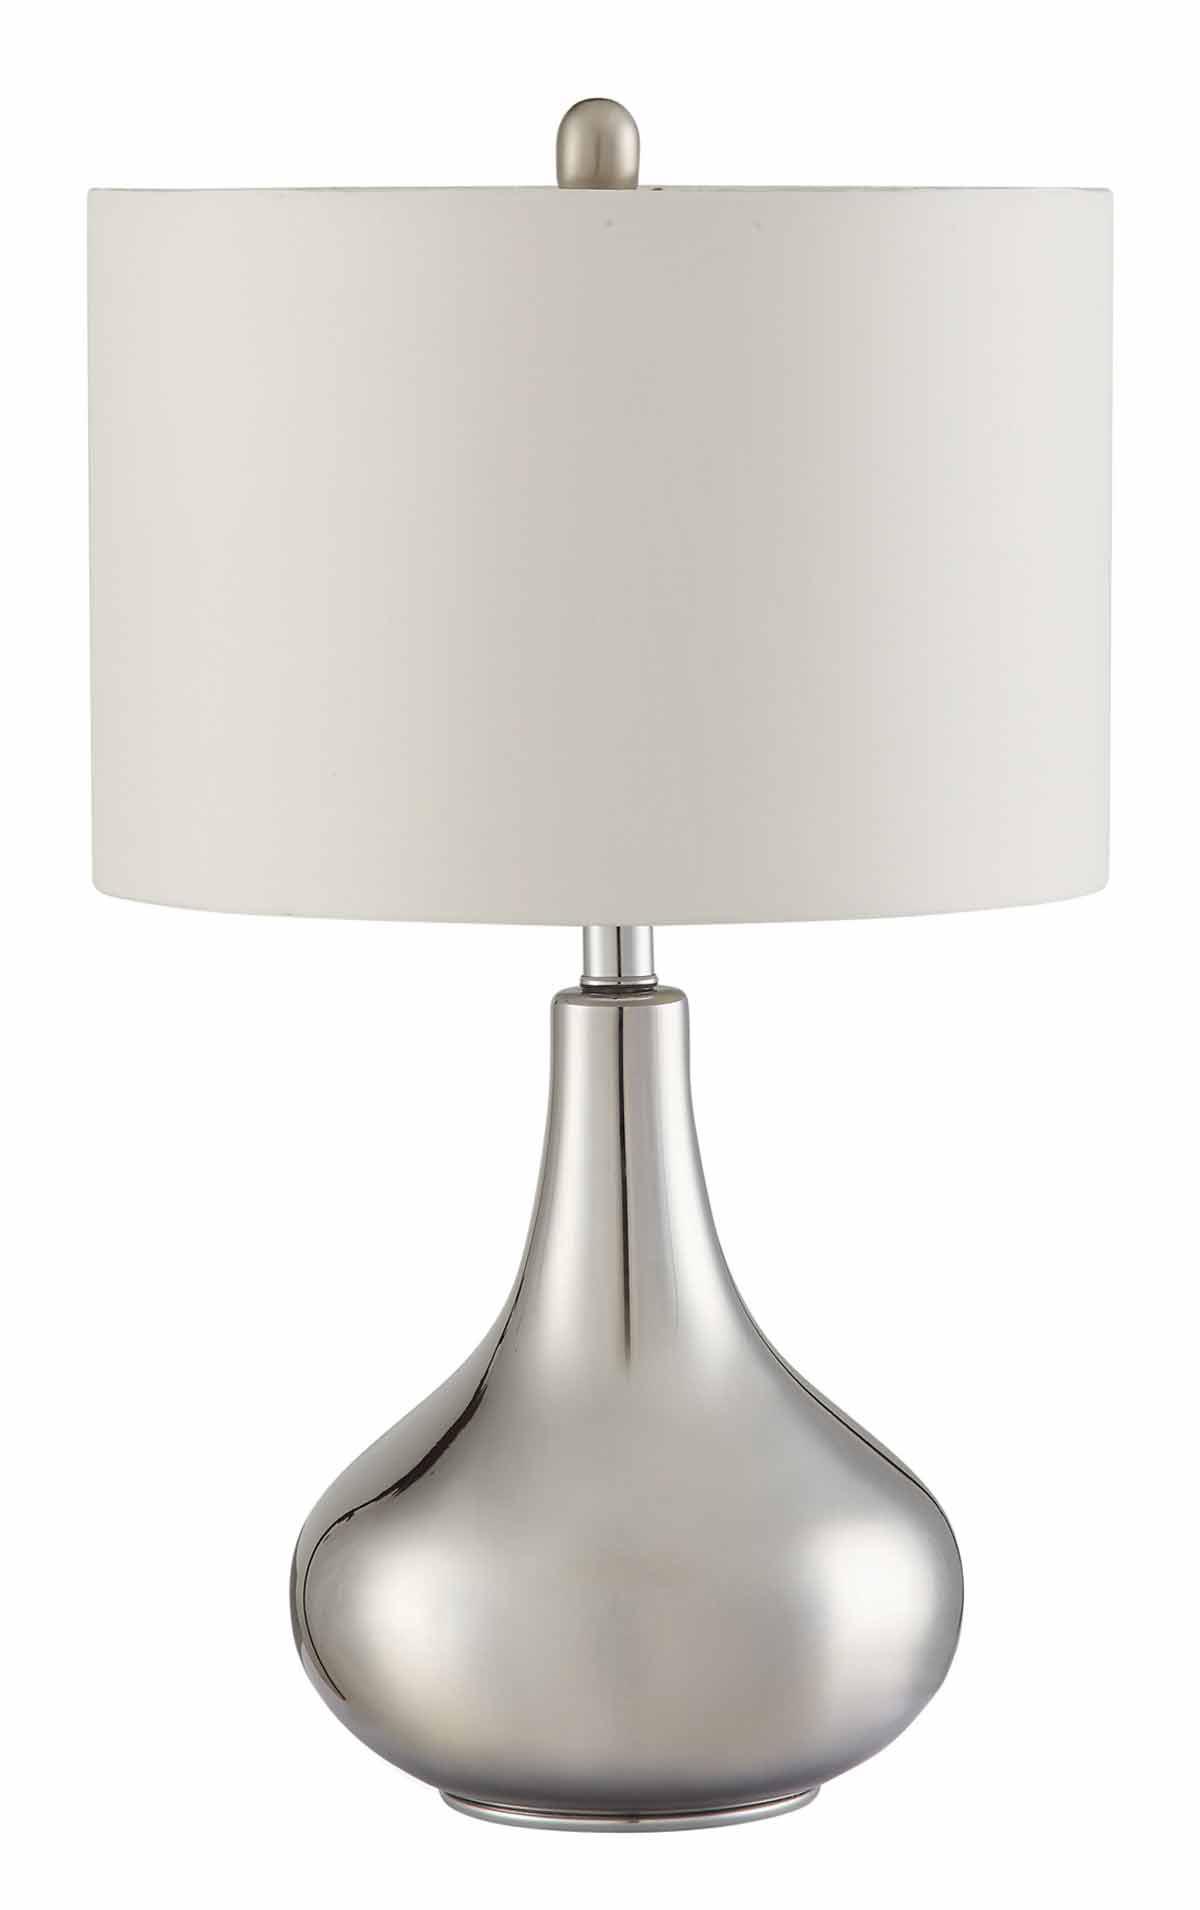 Coaster 901525 Table Lamp - Chrome